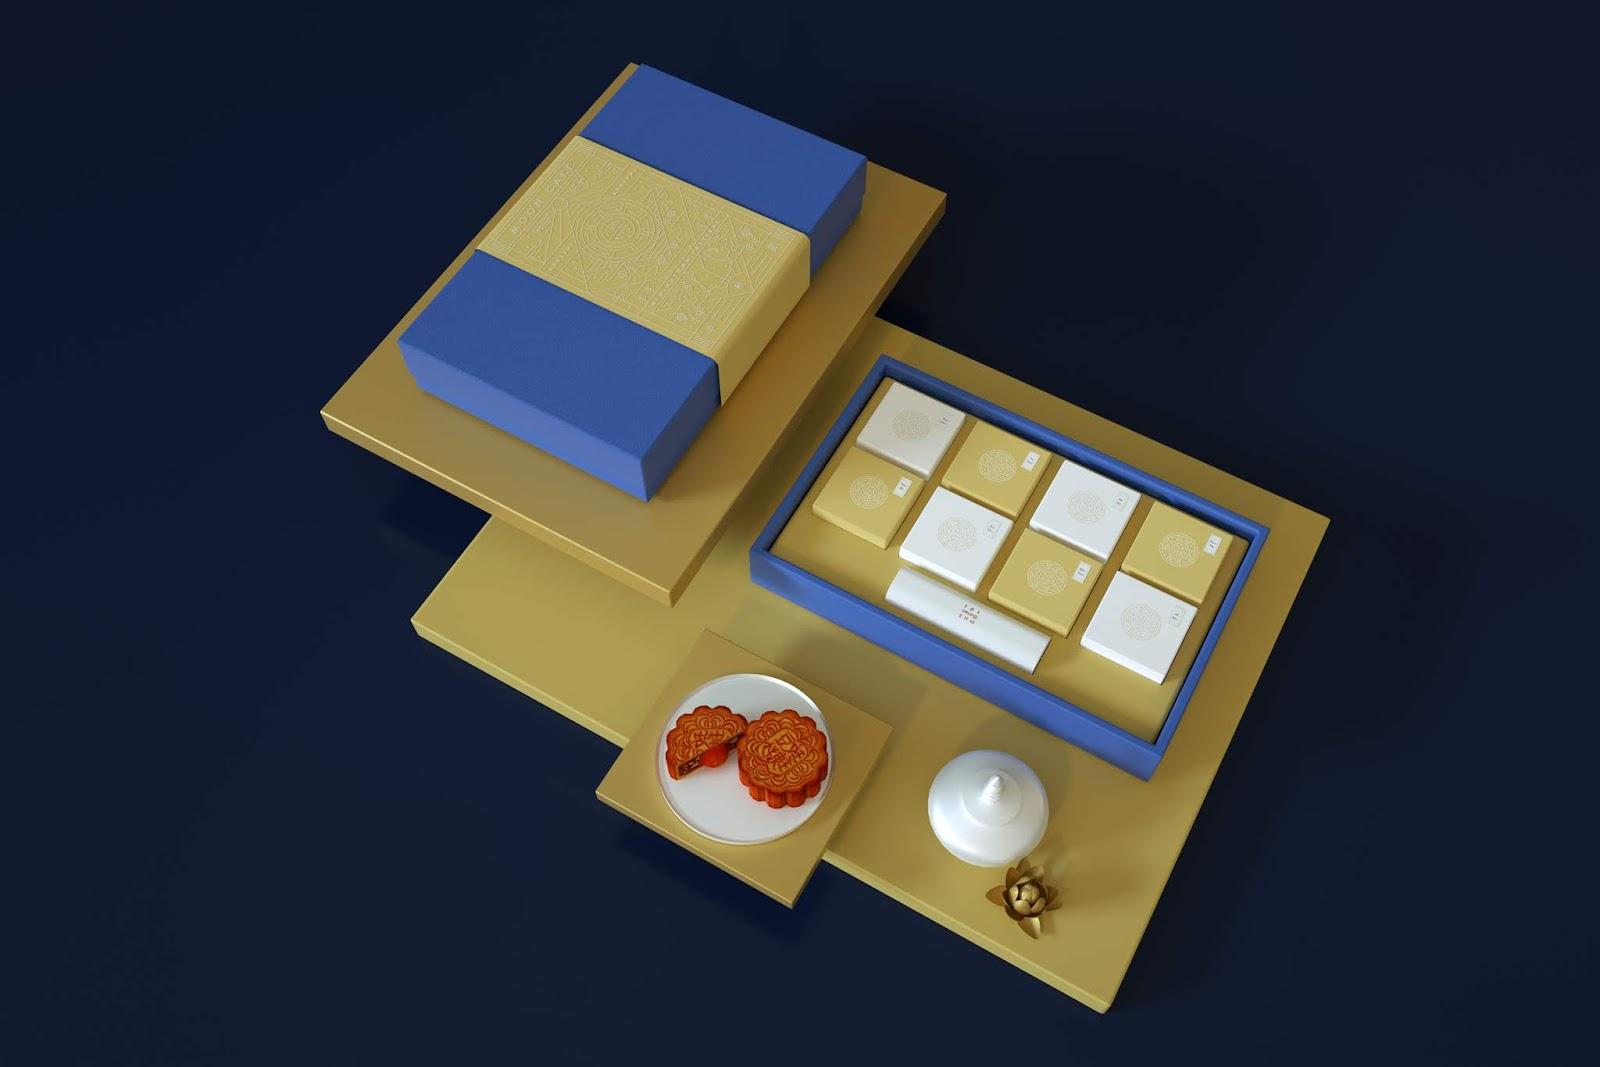 Tet Trung Thu 月饼新年礼6